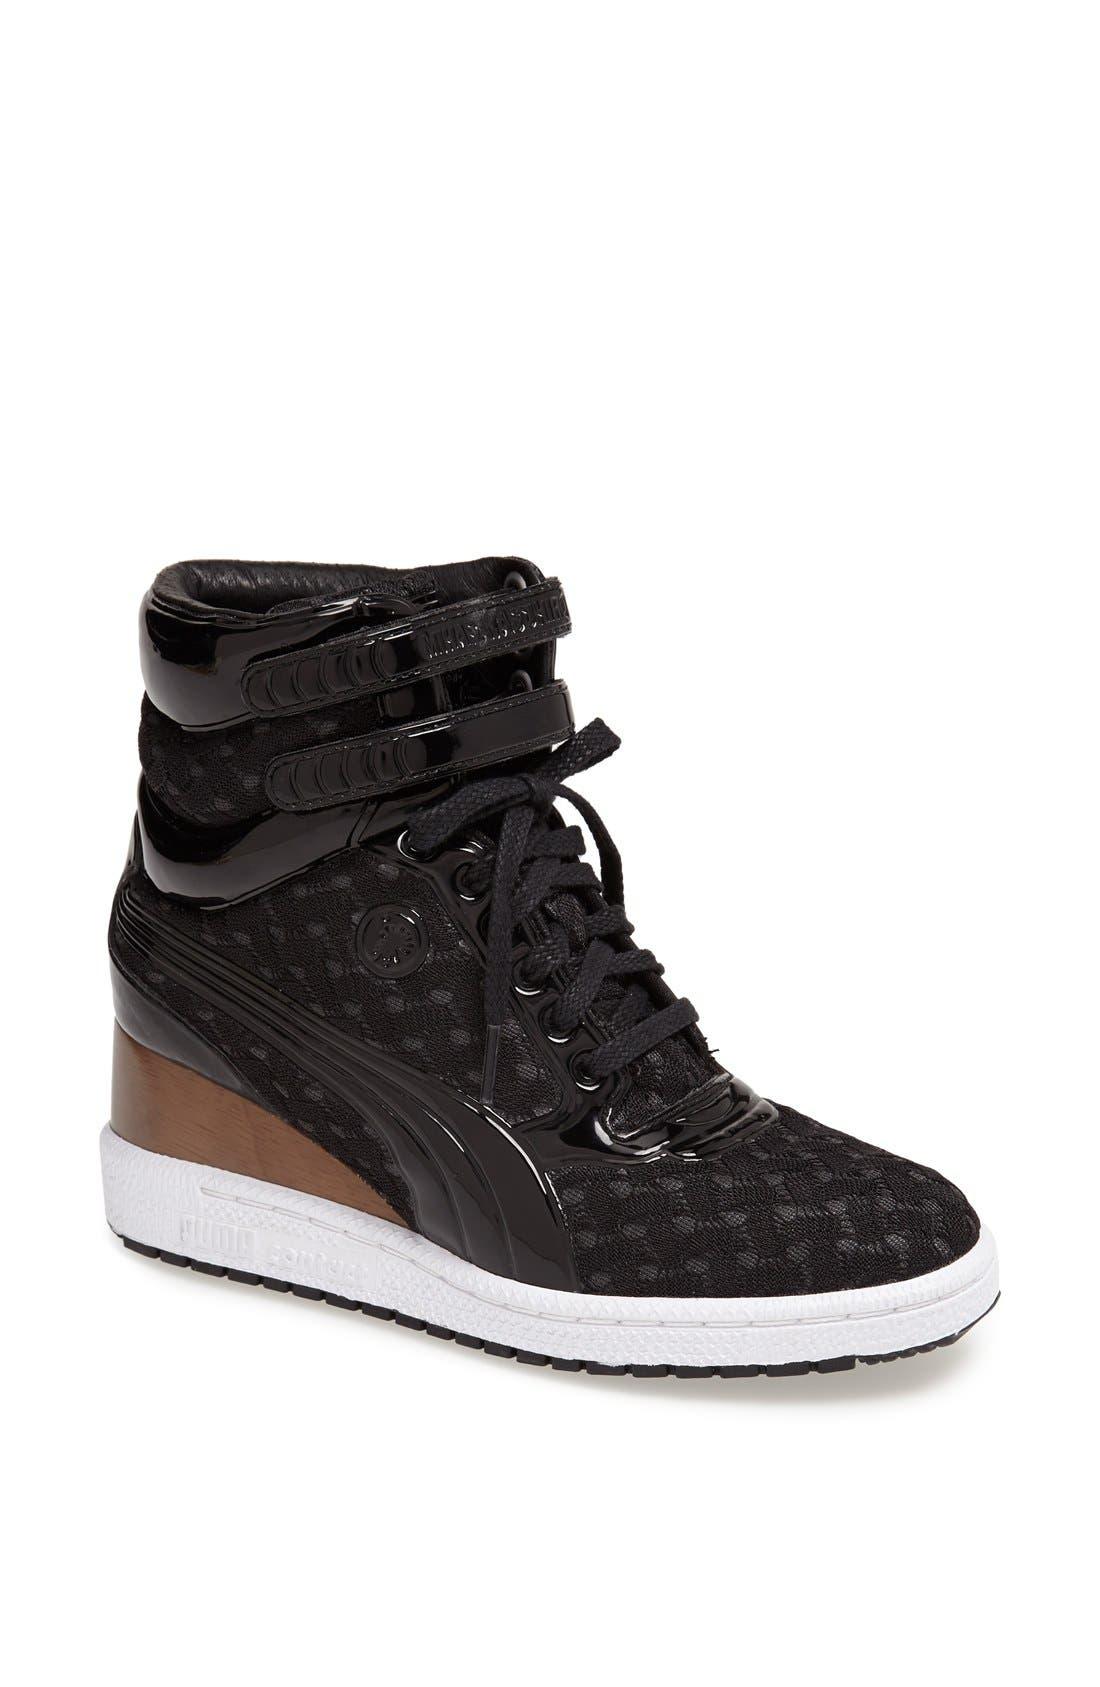 Main Image - PUMA 'My 77' Sneaker (Women)